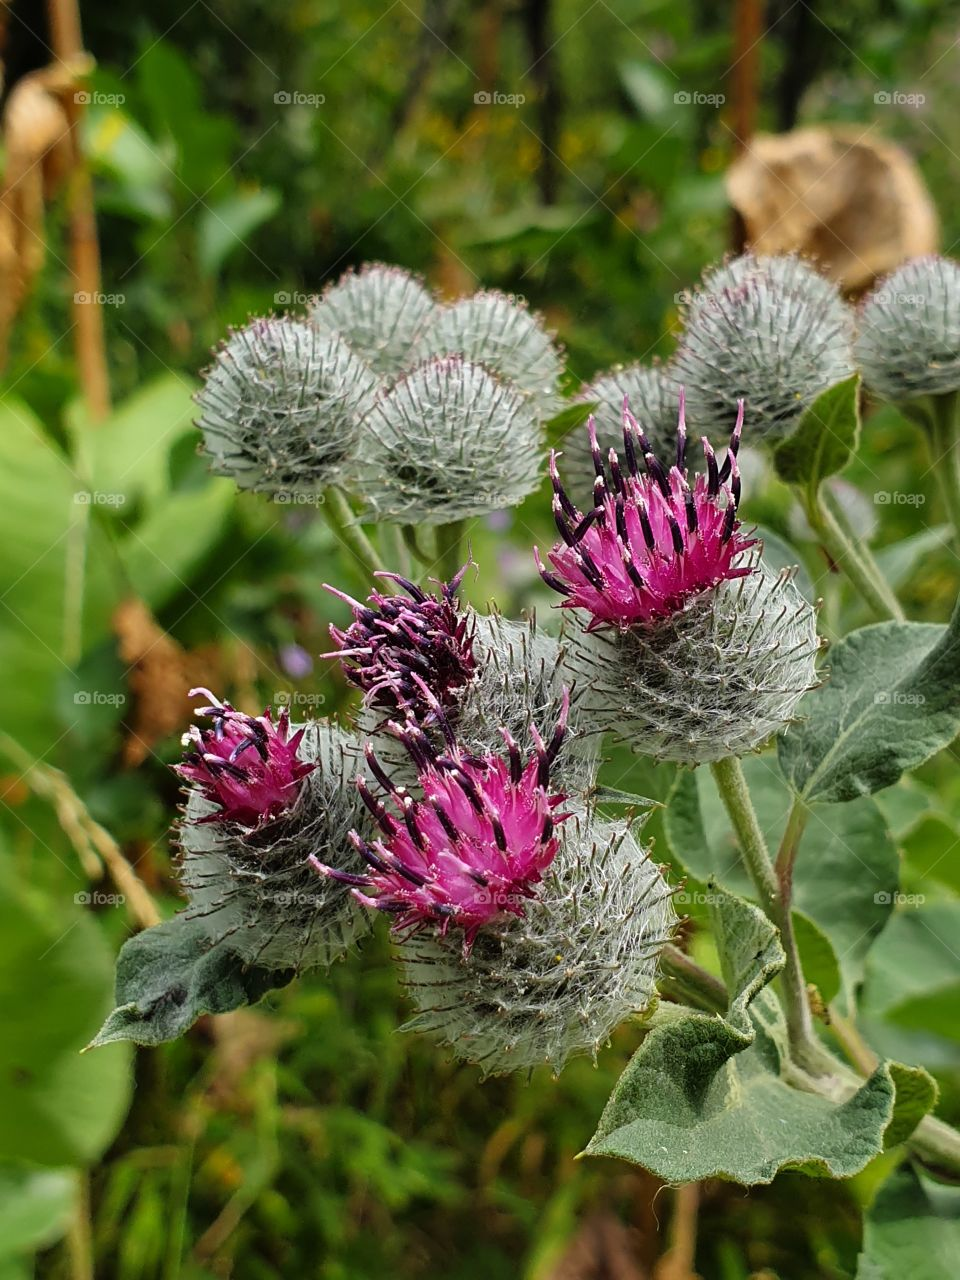 camel-thorn flowers